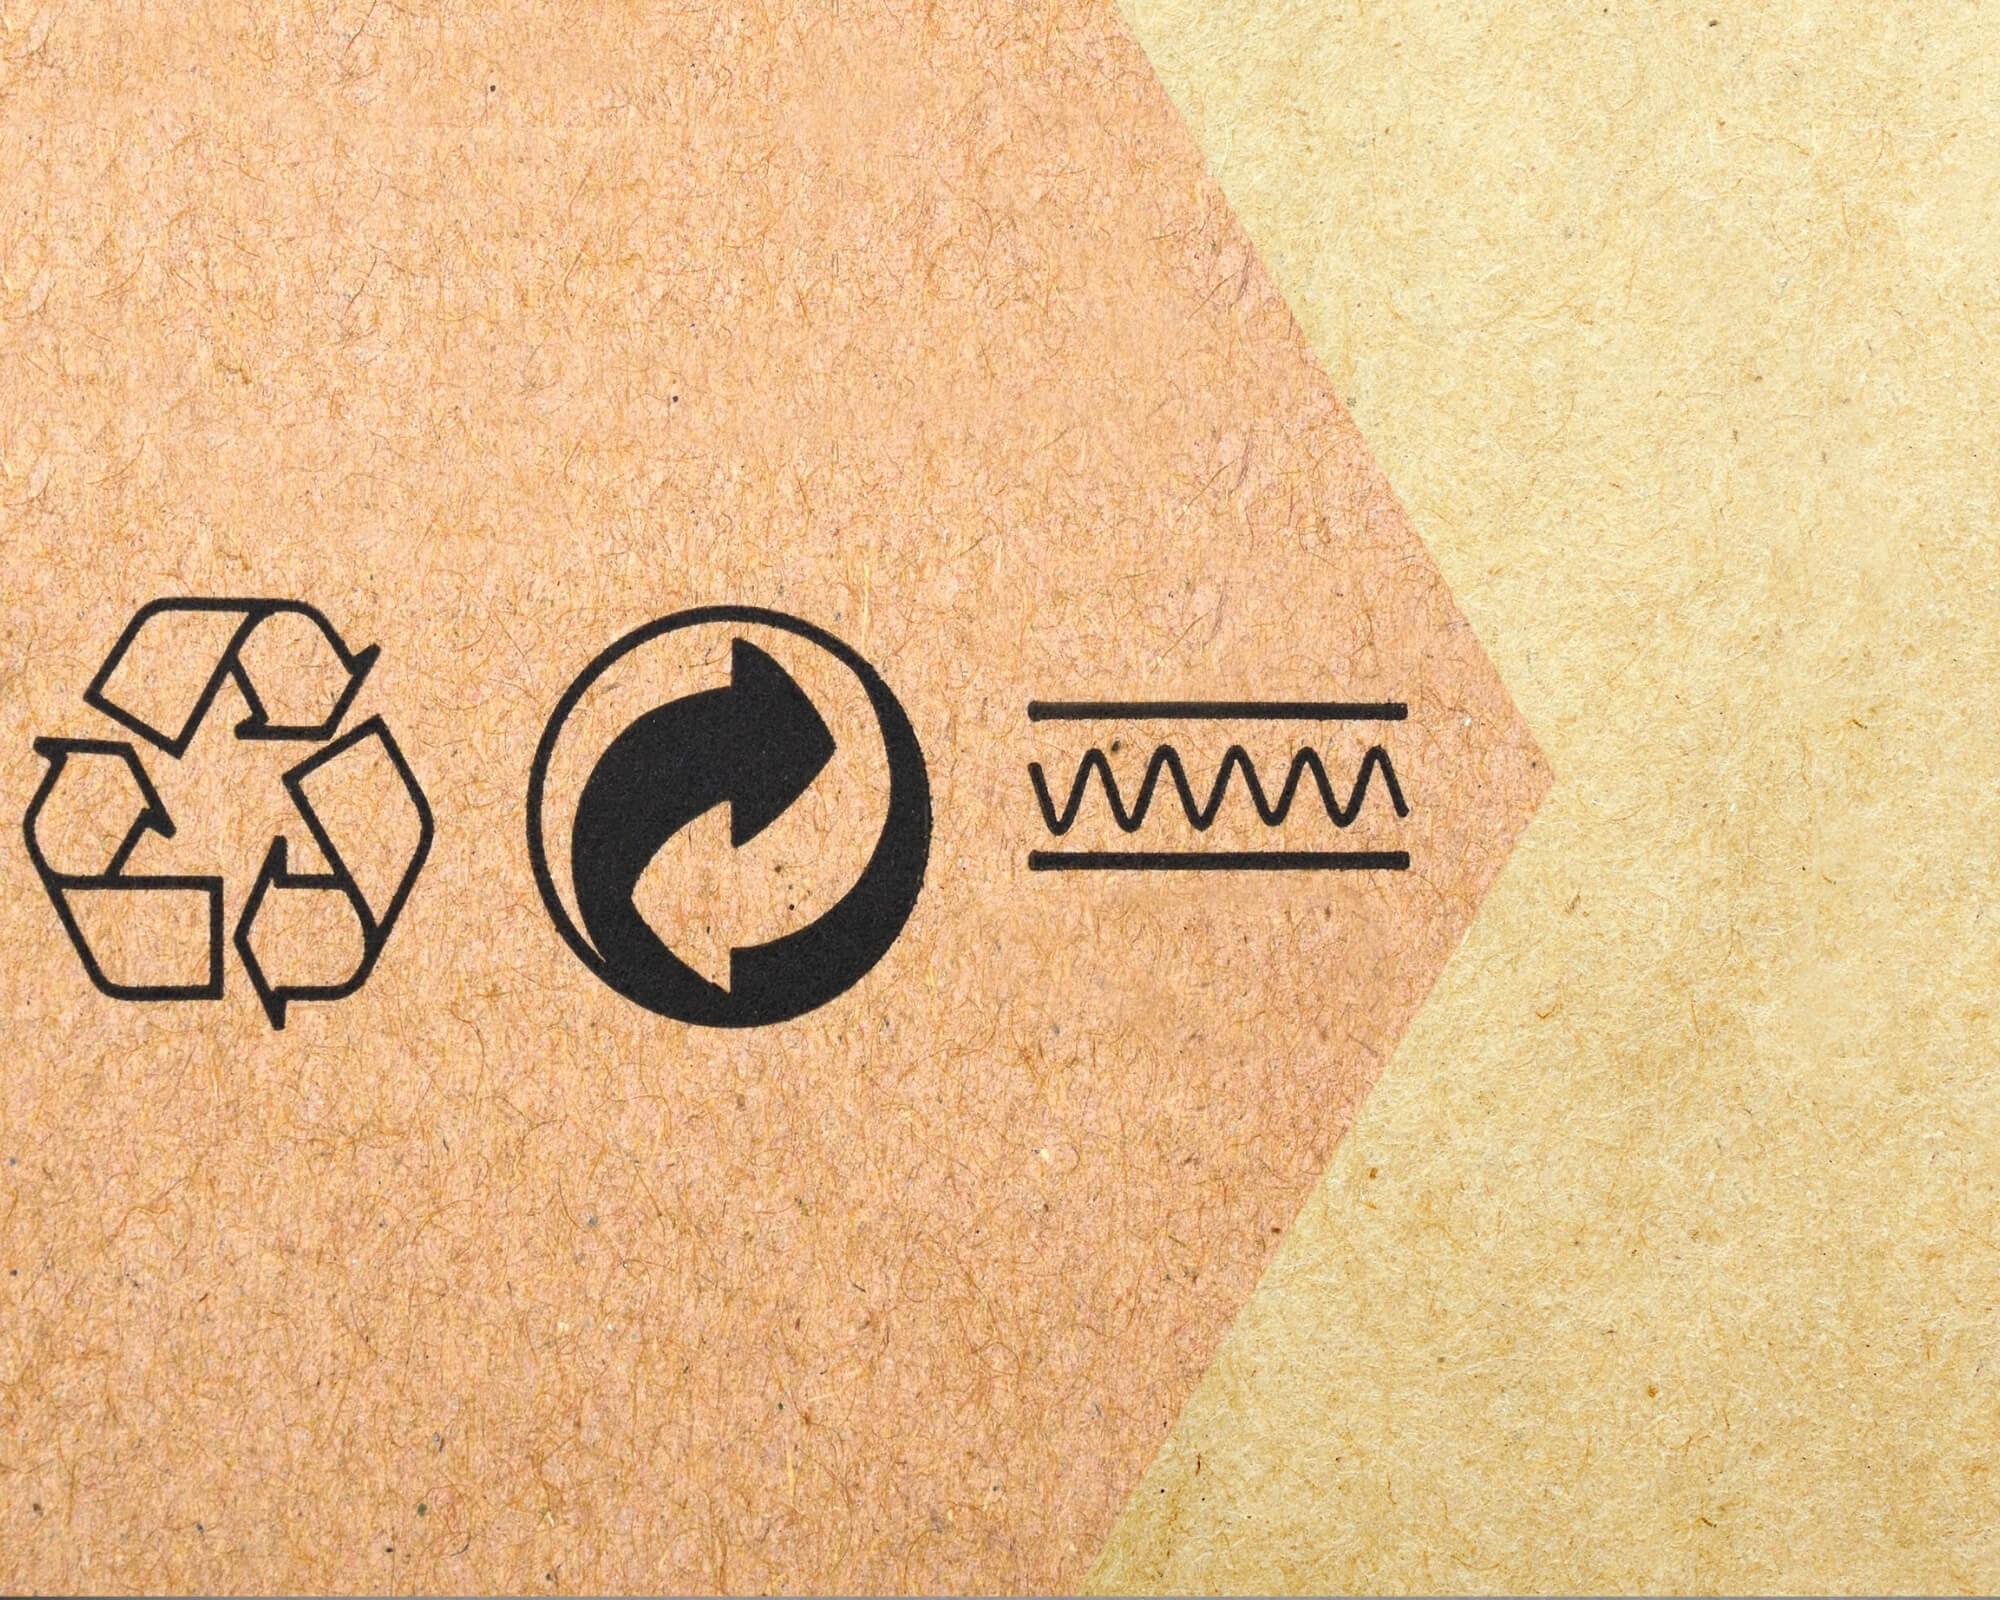 símbolos de packaging ecológico